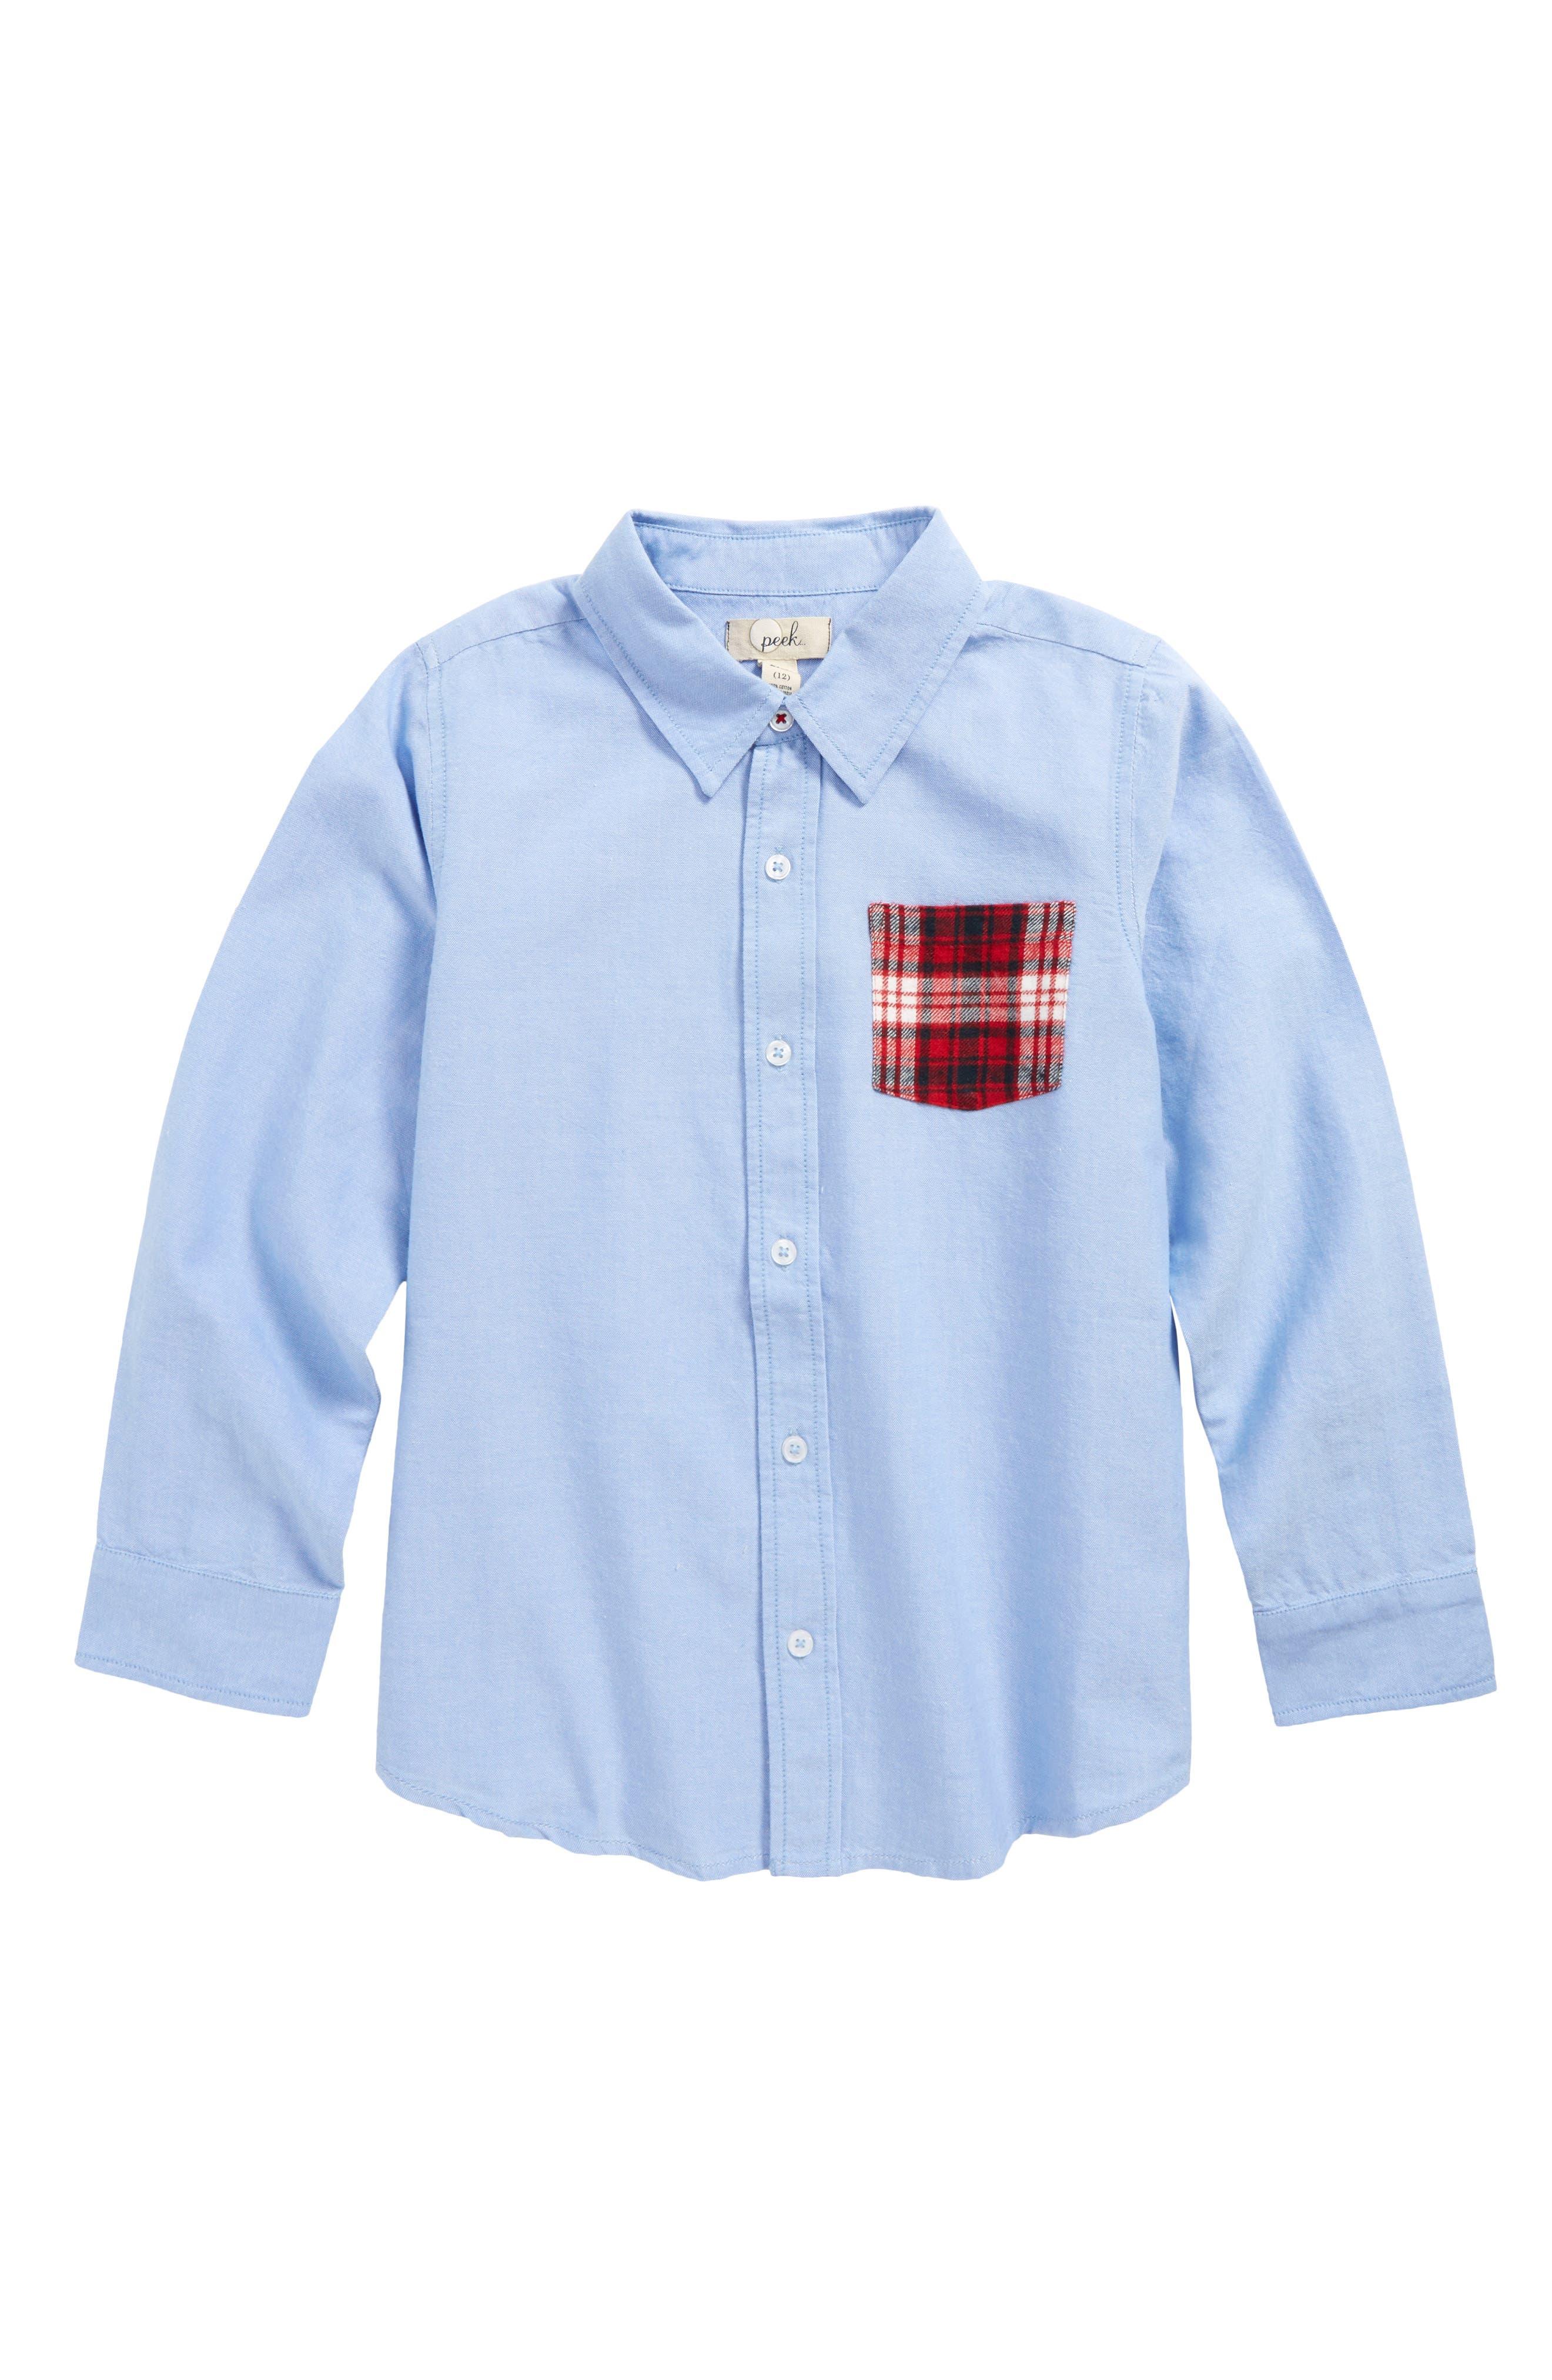 Main Image - Peek Johnny Oxford Shirt (Toddler Boys, Little Boys & Big Boys)